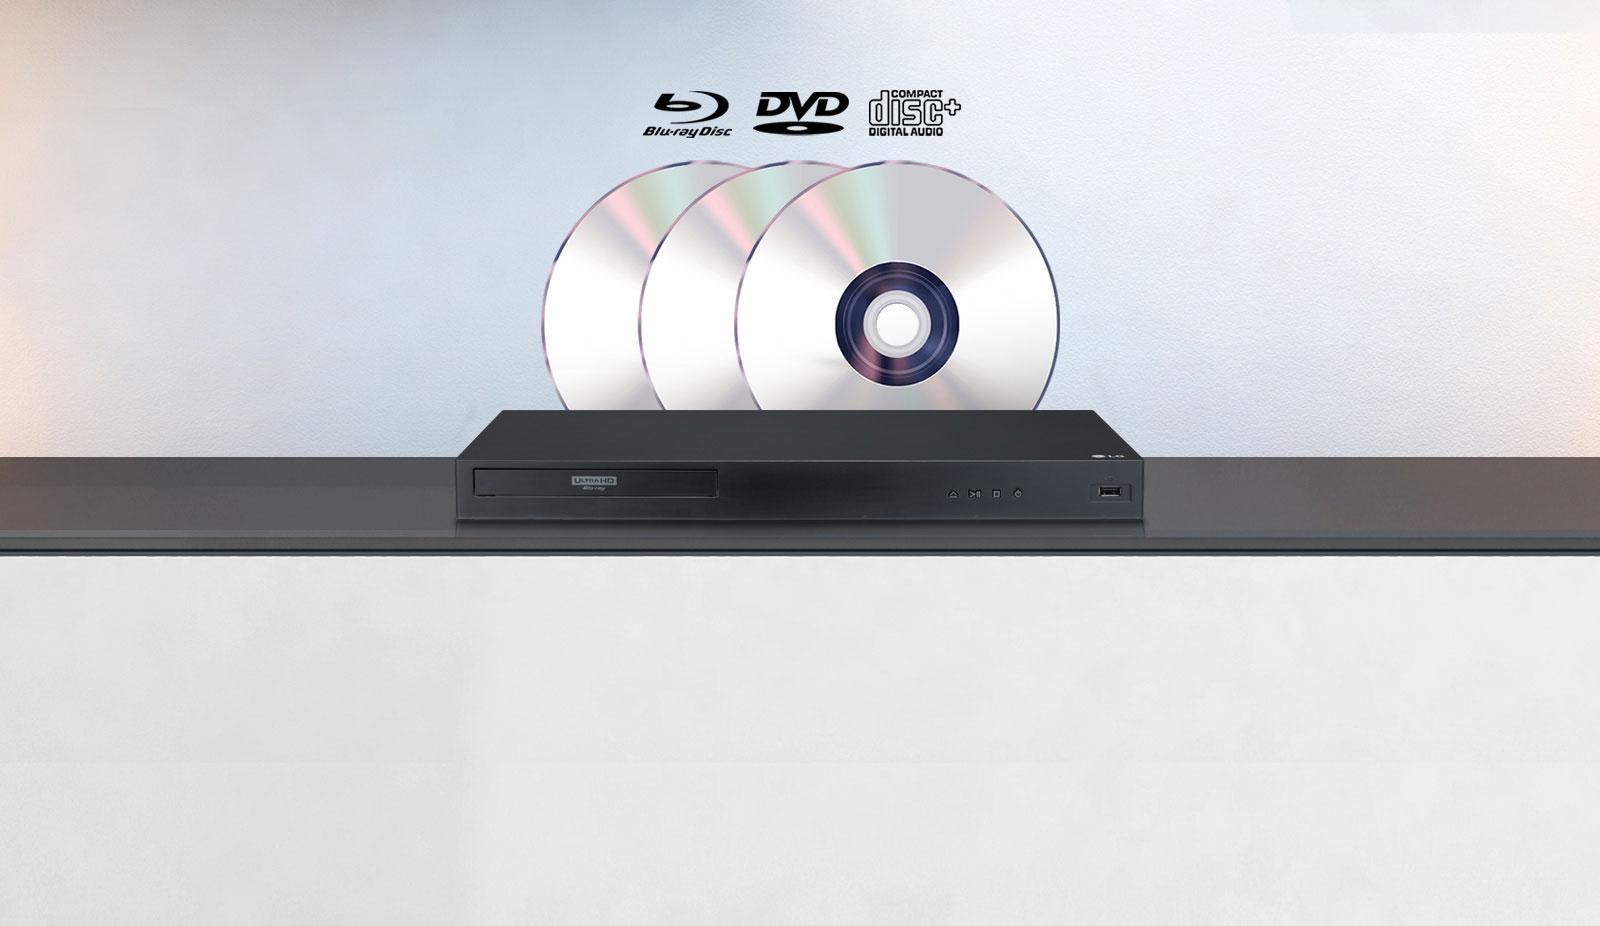 05_UBK90_Blu-ray_DVD_CD_Playback_Desktop01